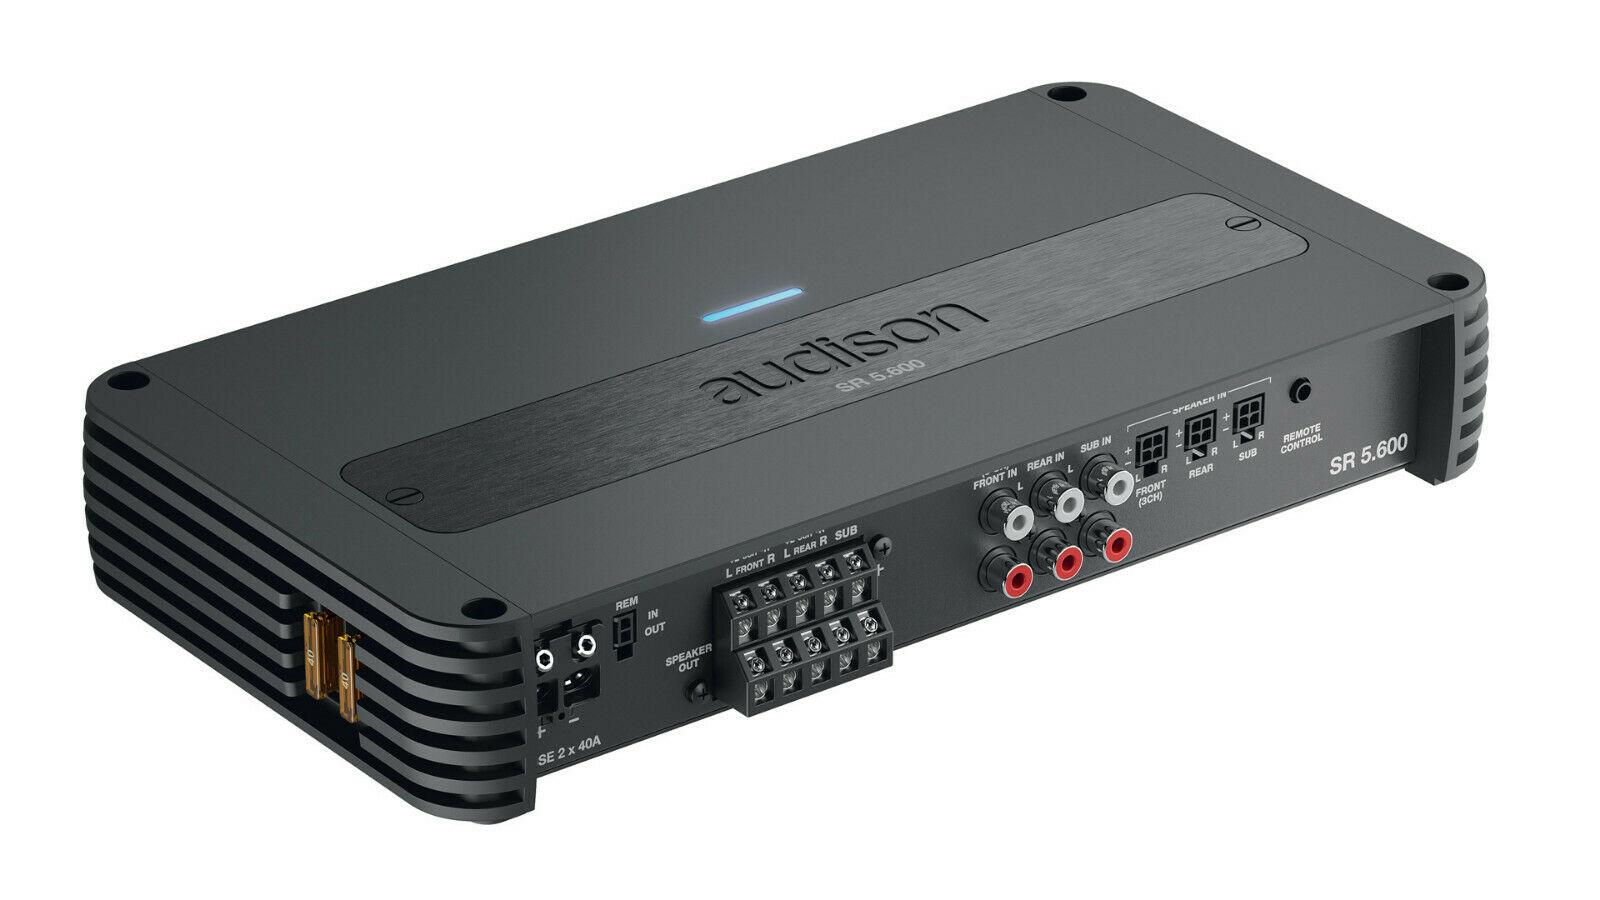 Audison SR 5.600 5-Kanal Verstärker Digital+Analog Endstufe 4x75+1x330 Wrms AMP